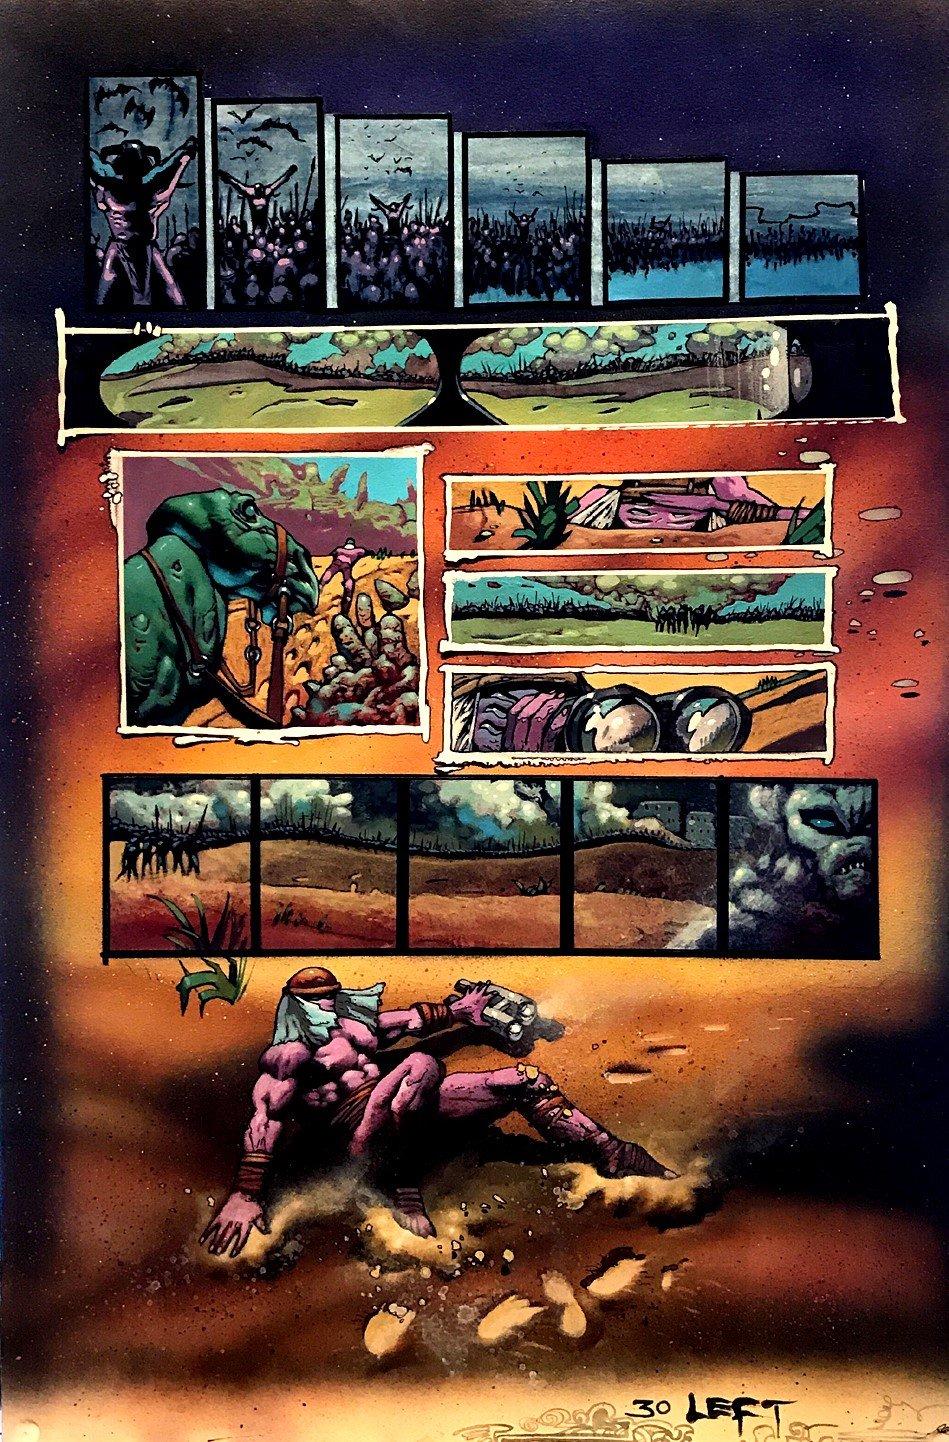 Melting Pot graphic Novel p 30 Painting (Large Art) 1994